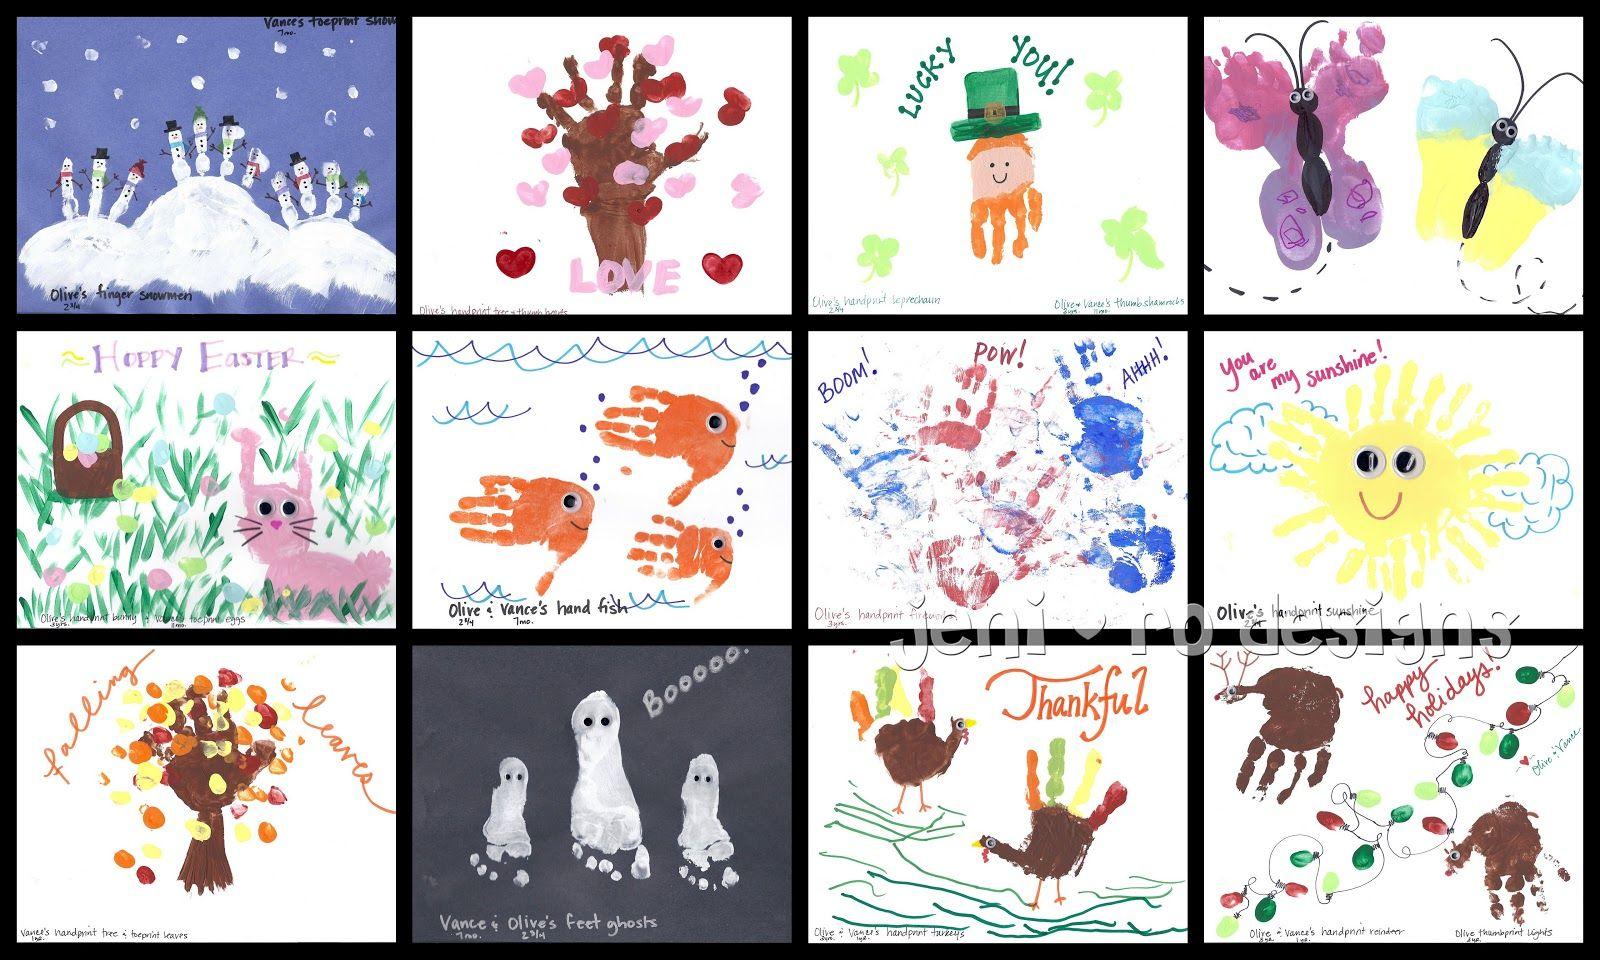 Calendar Ideas For Grandparents : Jeni ro designs kids handprint calendar gift ideas